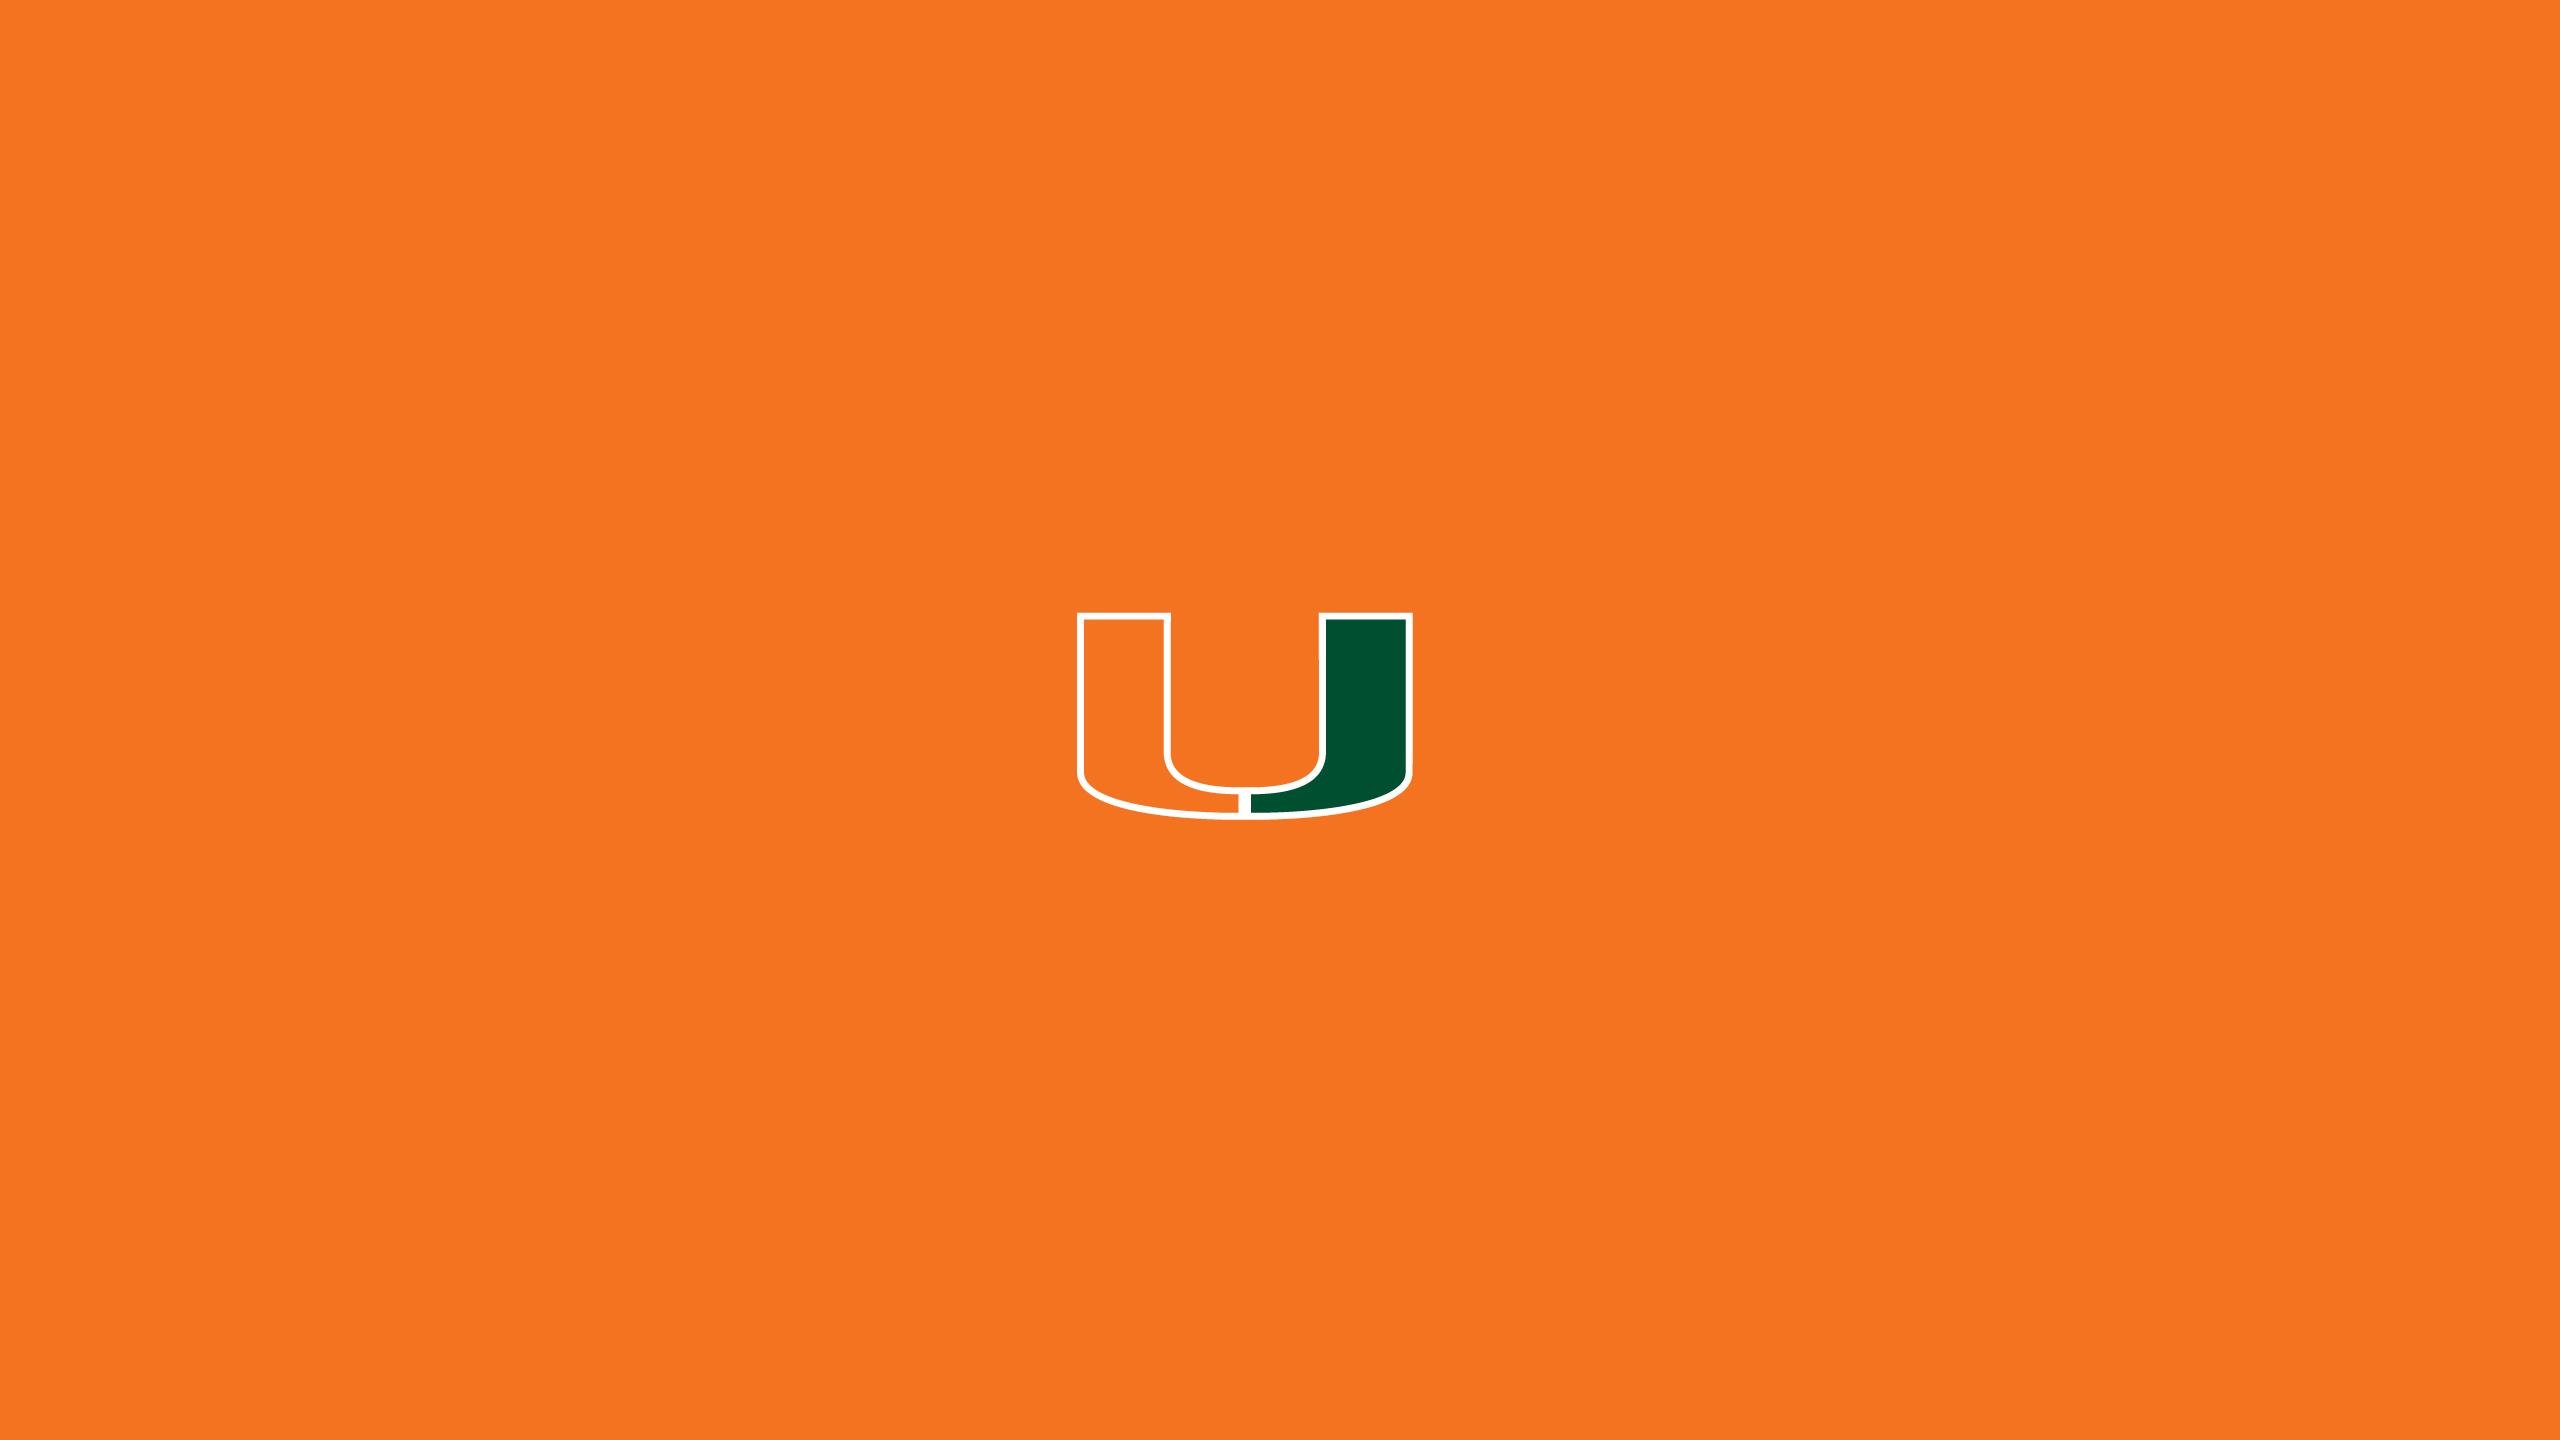 University Of Miami Wallpaper Hd Download Free Miami Hurricanes Wallpapers Pixelstalk Net